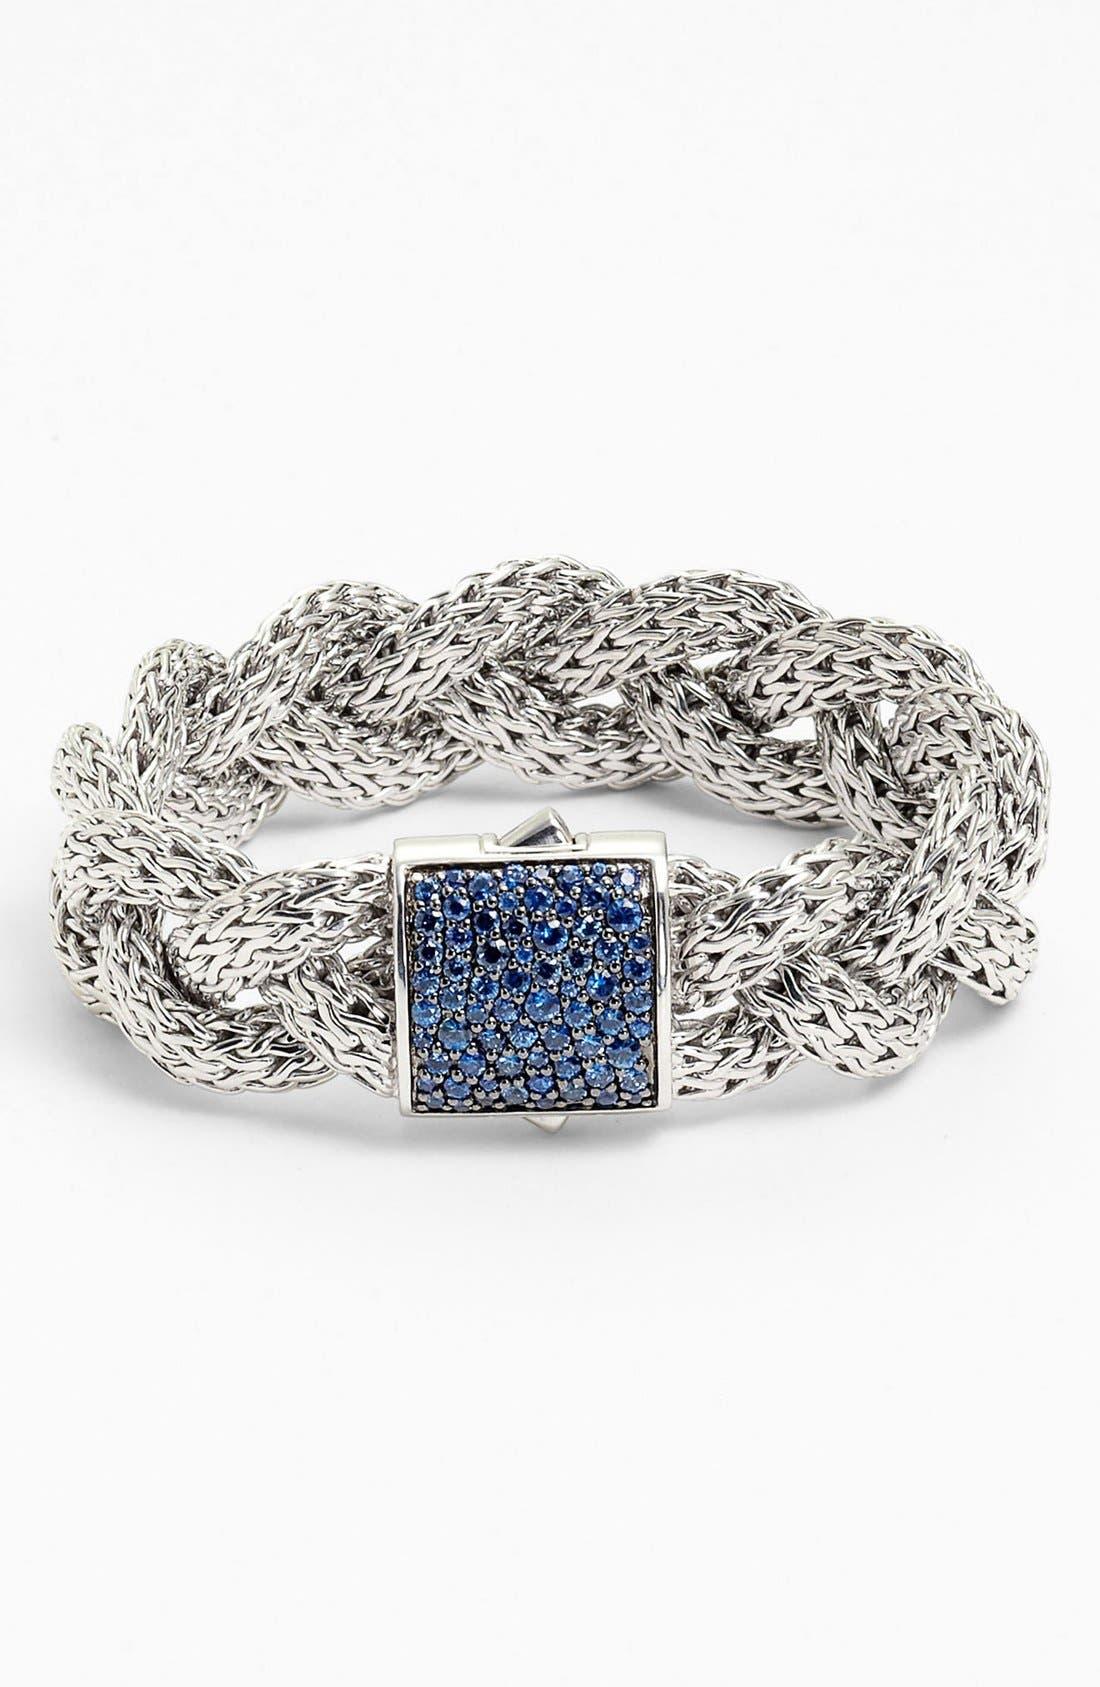 Main Image - John Hardy 'Classic Chain' Large Braided Bracelet